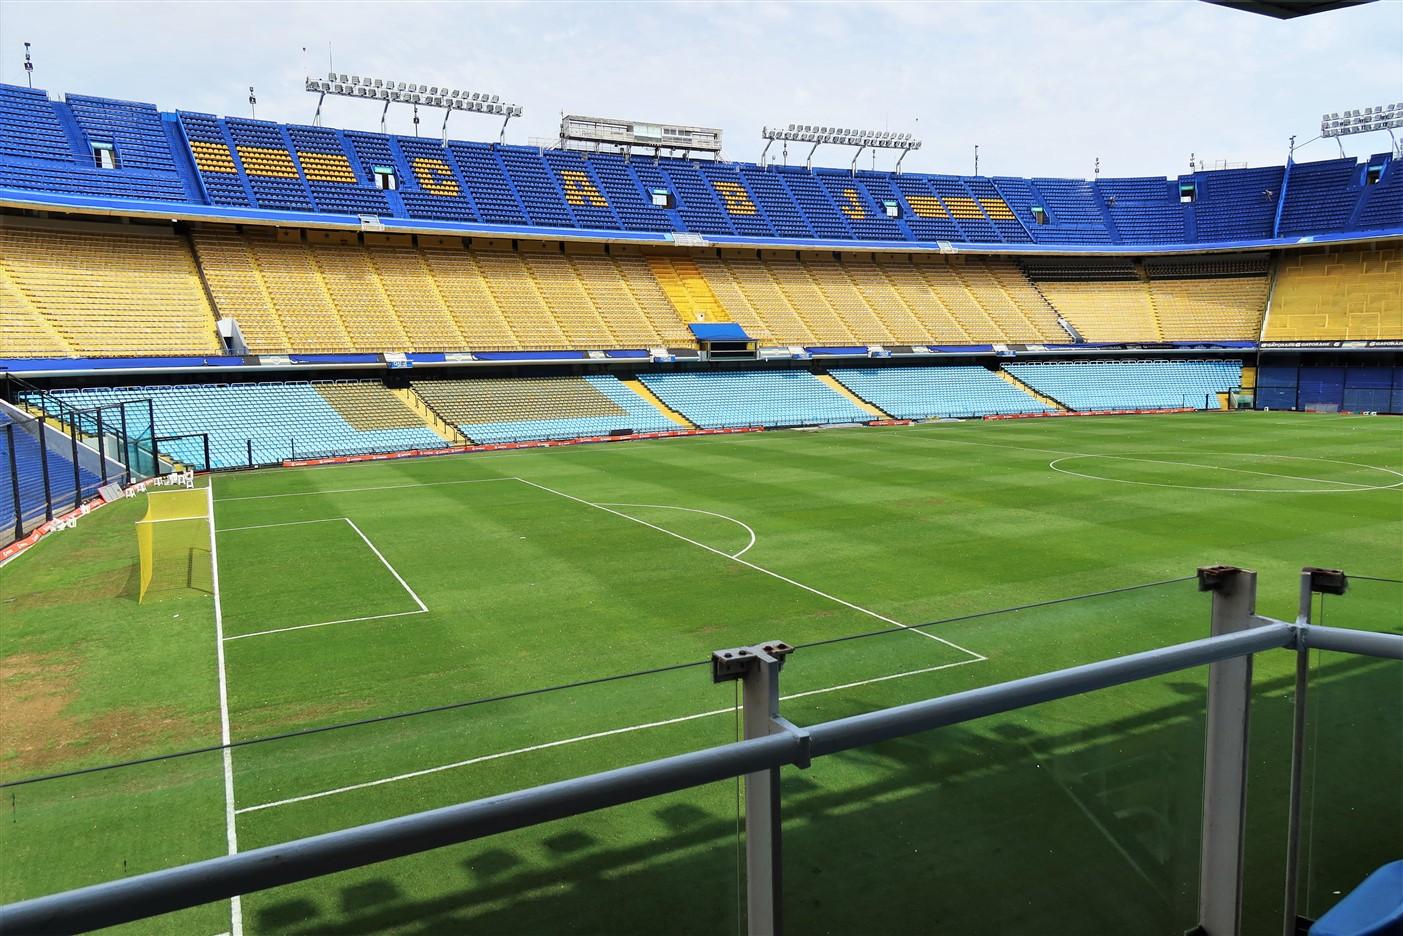 2020 03 08 28 Buenos Aires Boca Juniors Soccer Team.jpg